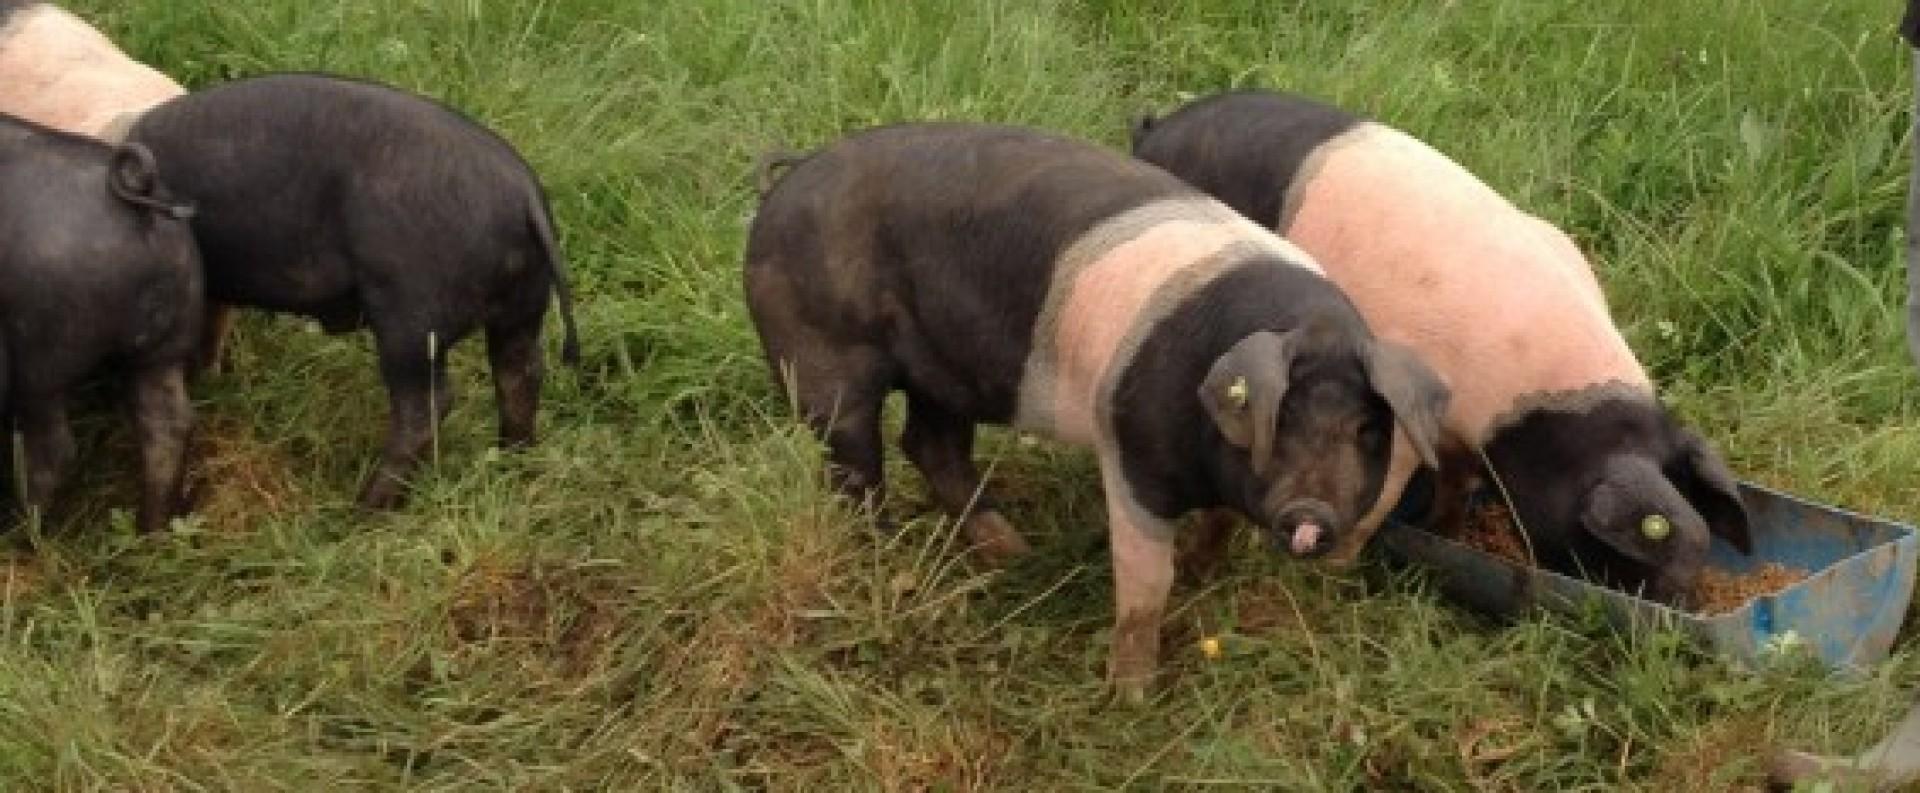 Burren Free Range Pork Farm